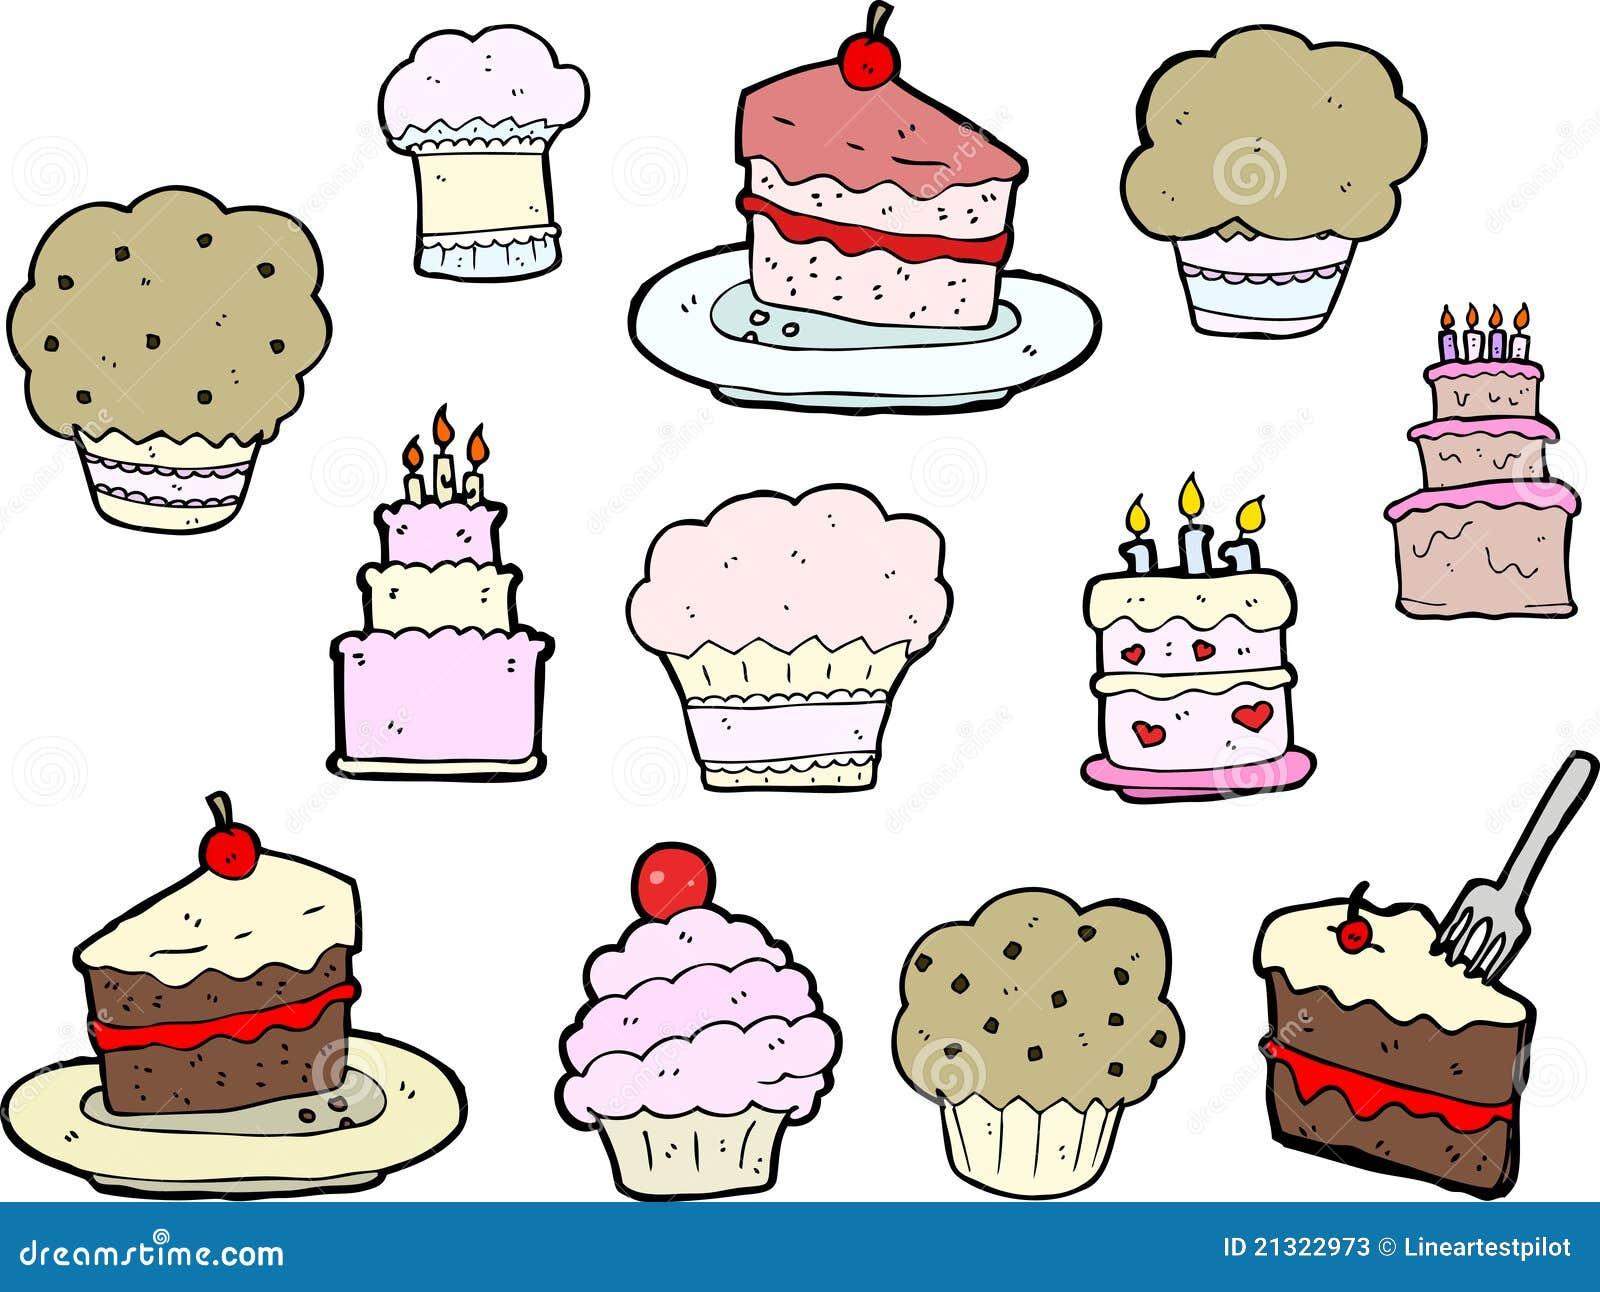 Cupcake And Cake Drawings Stock Photos Image 21322973